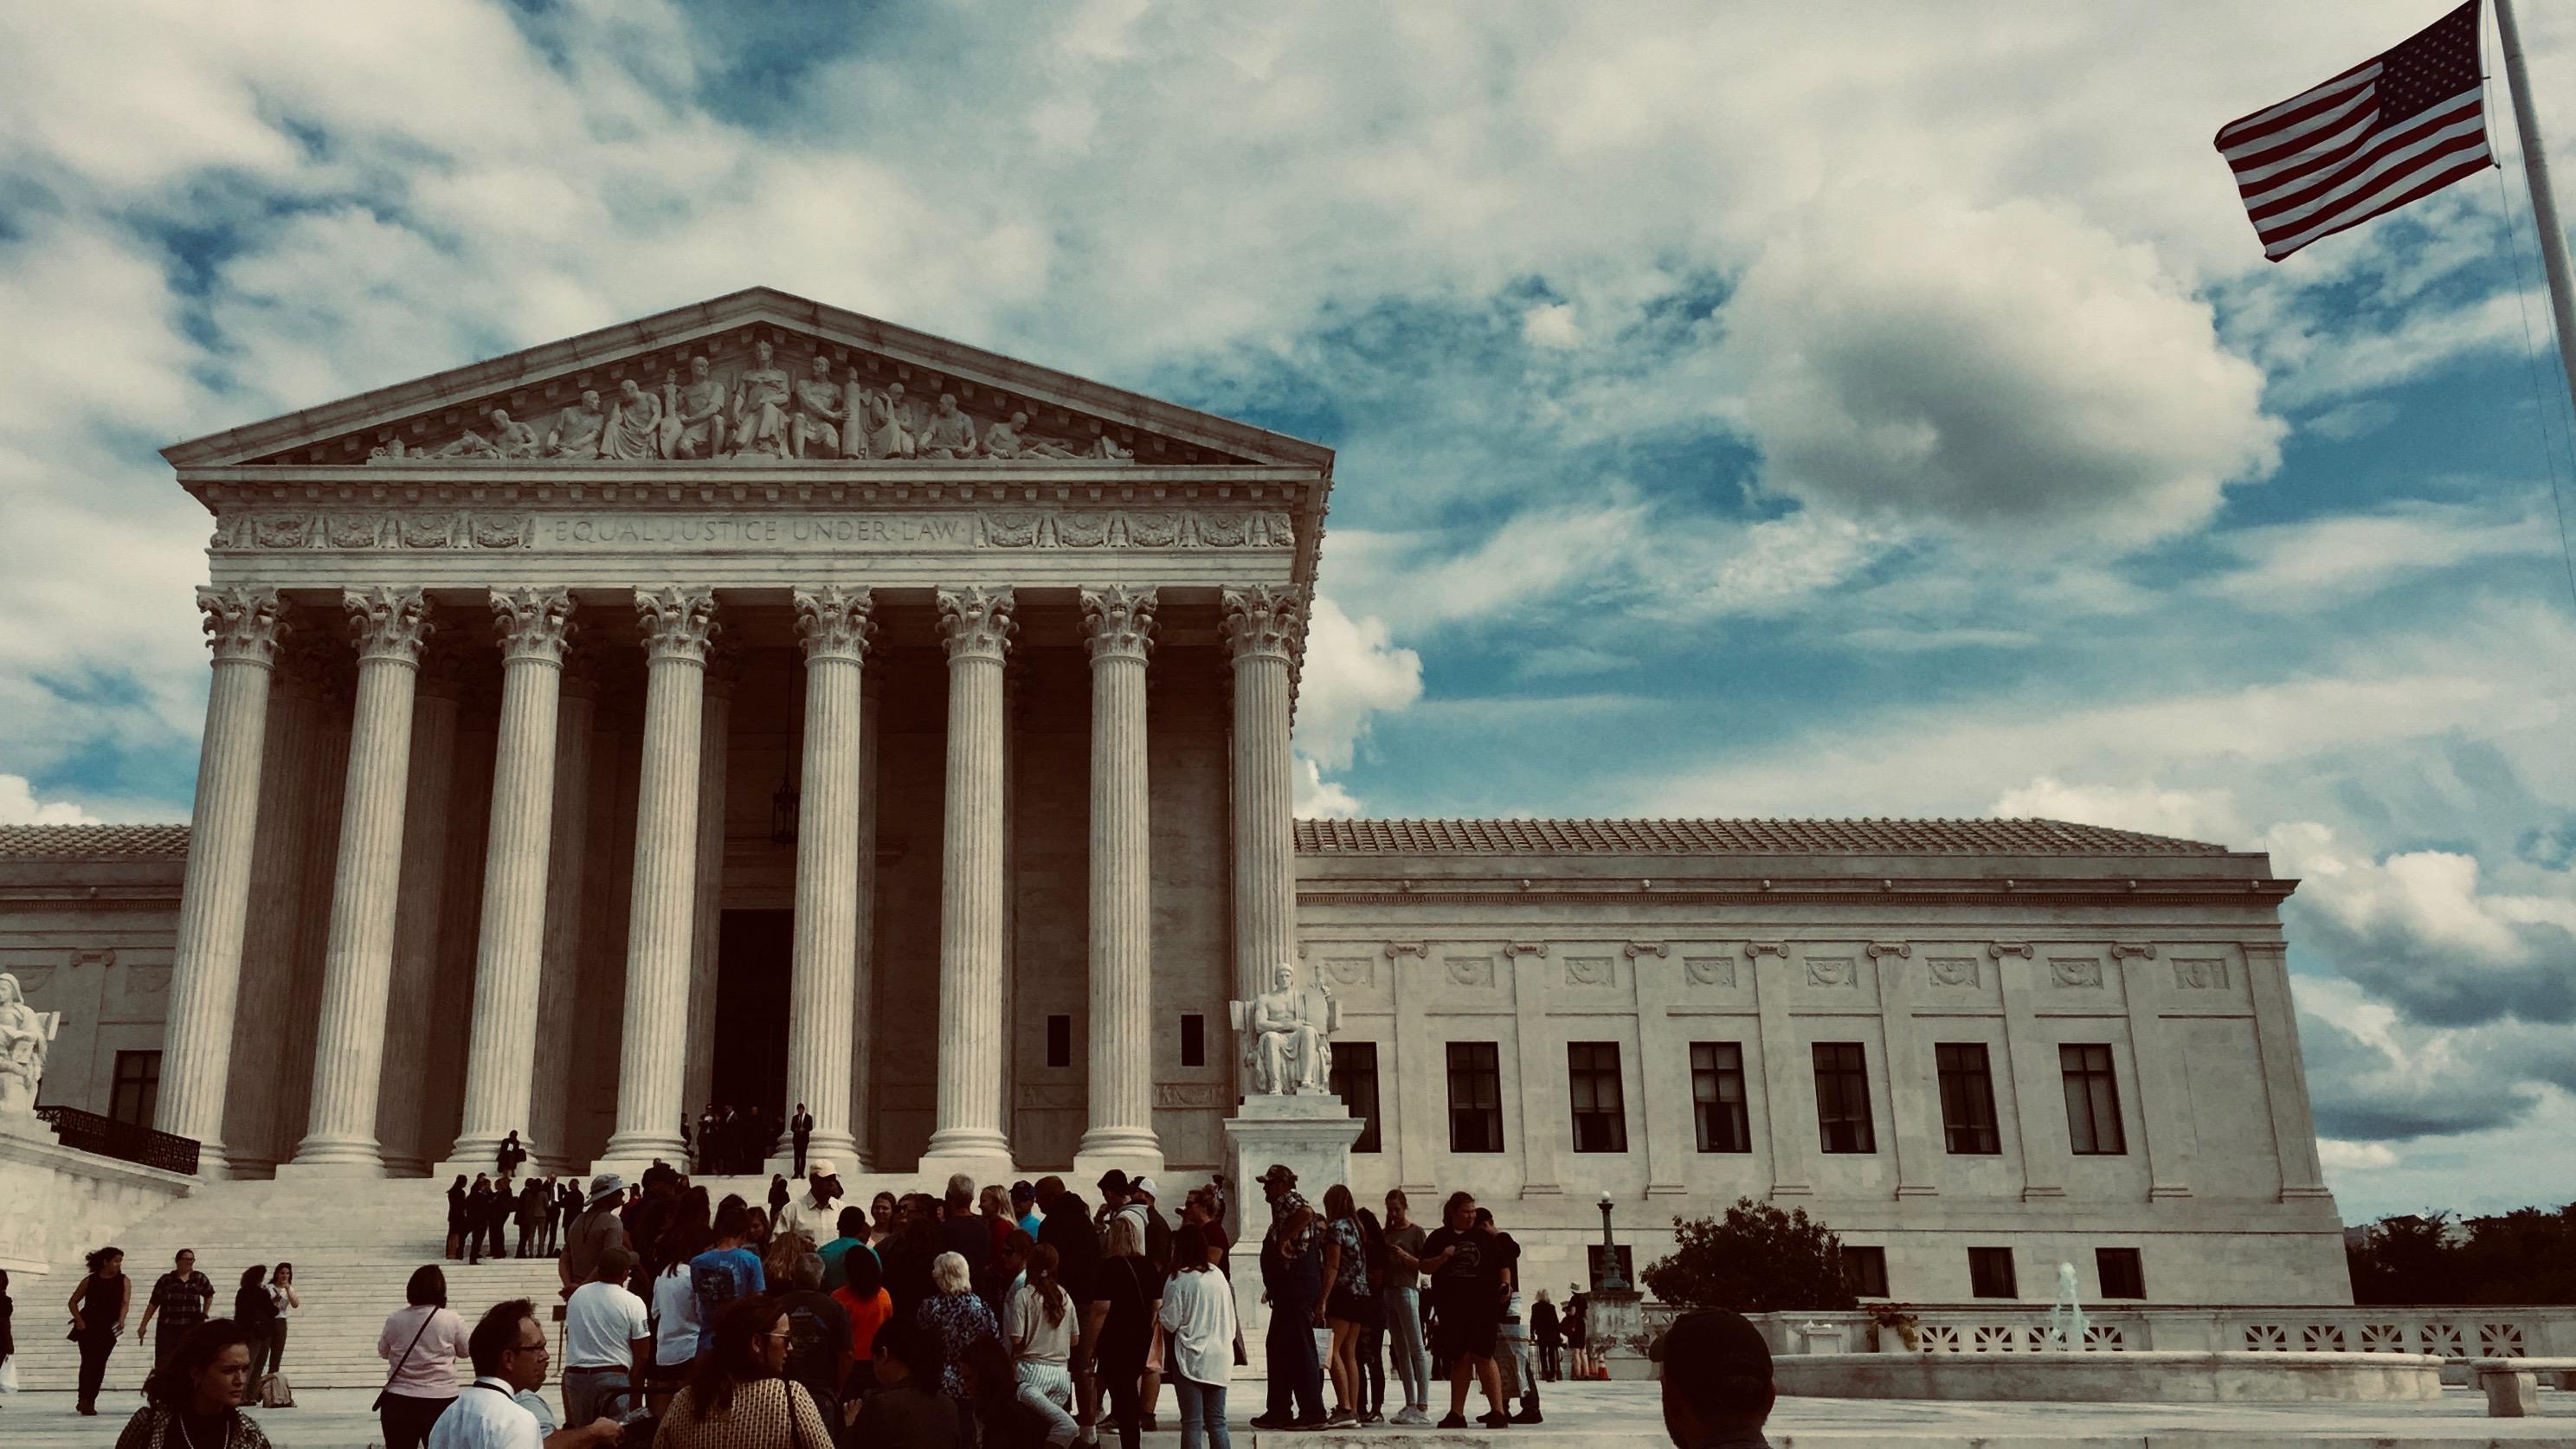 Outside the Supreme Court.